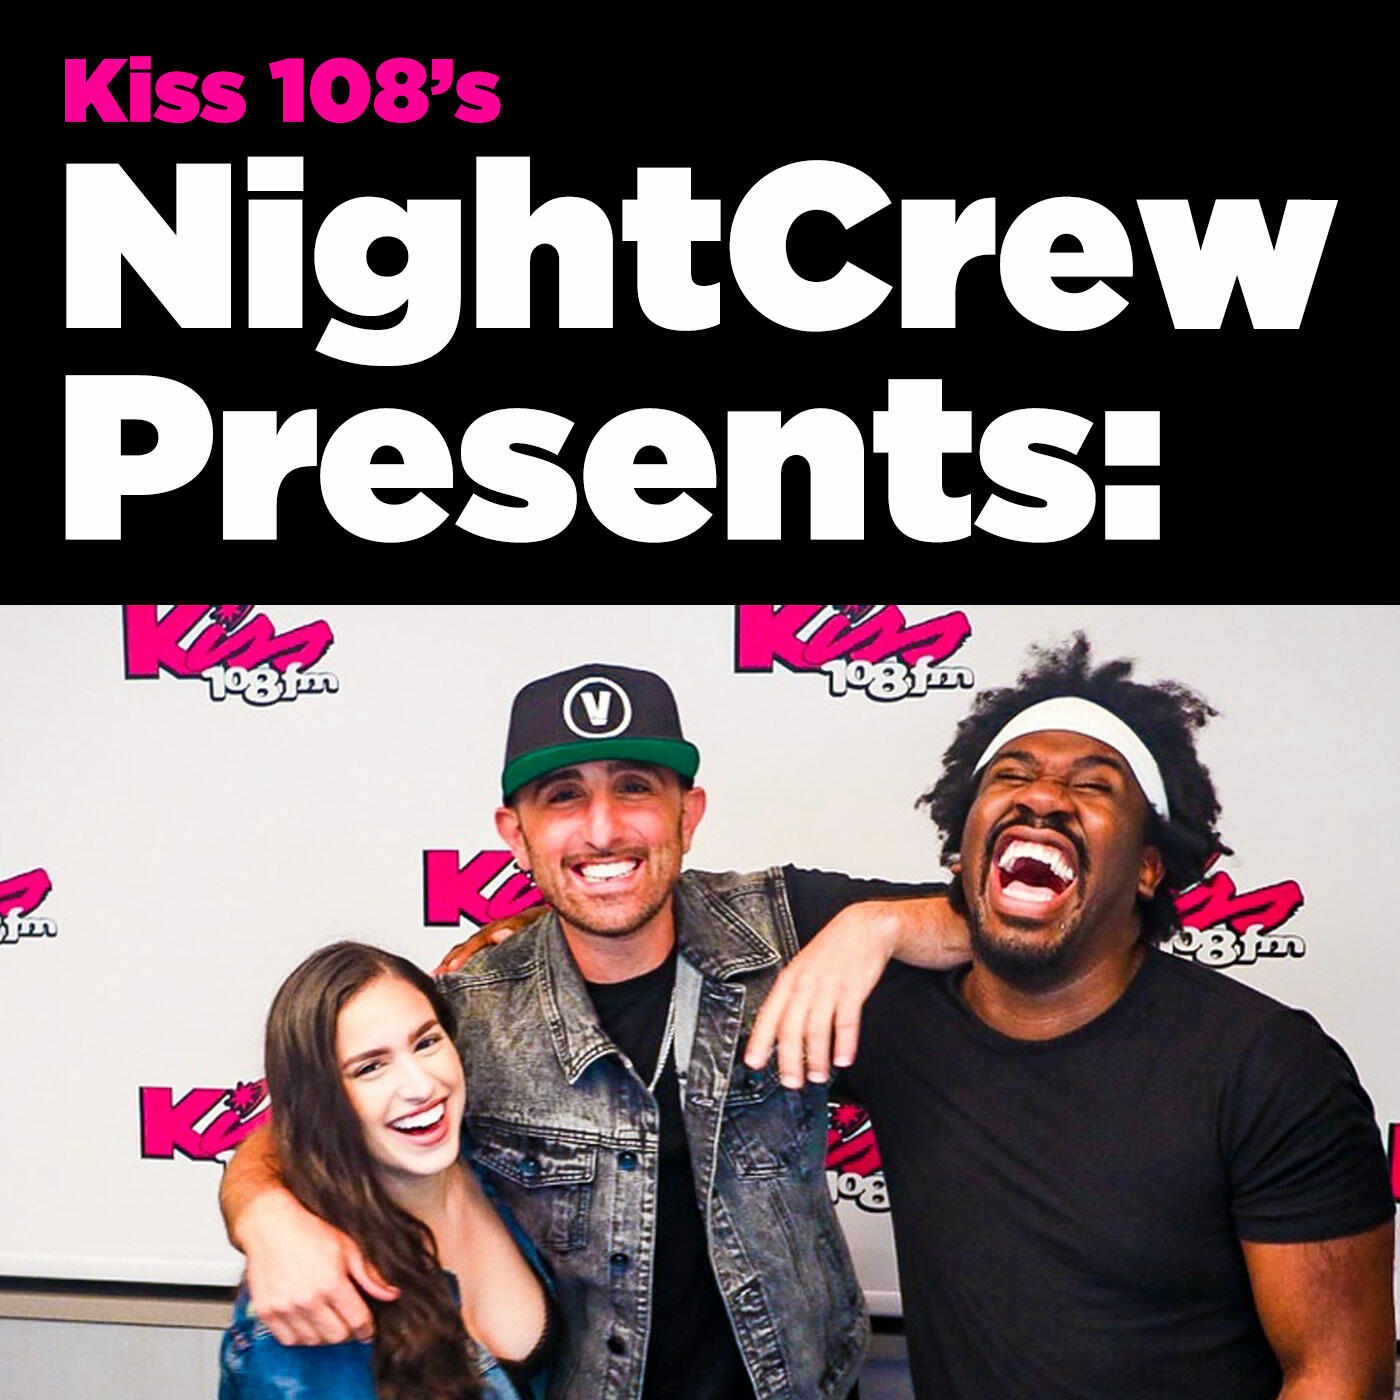 Kiss 108's NightCrew Presents: